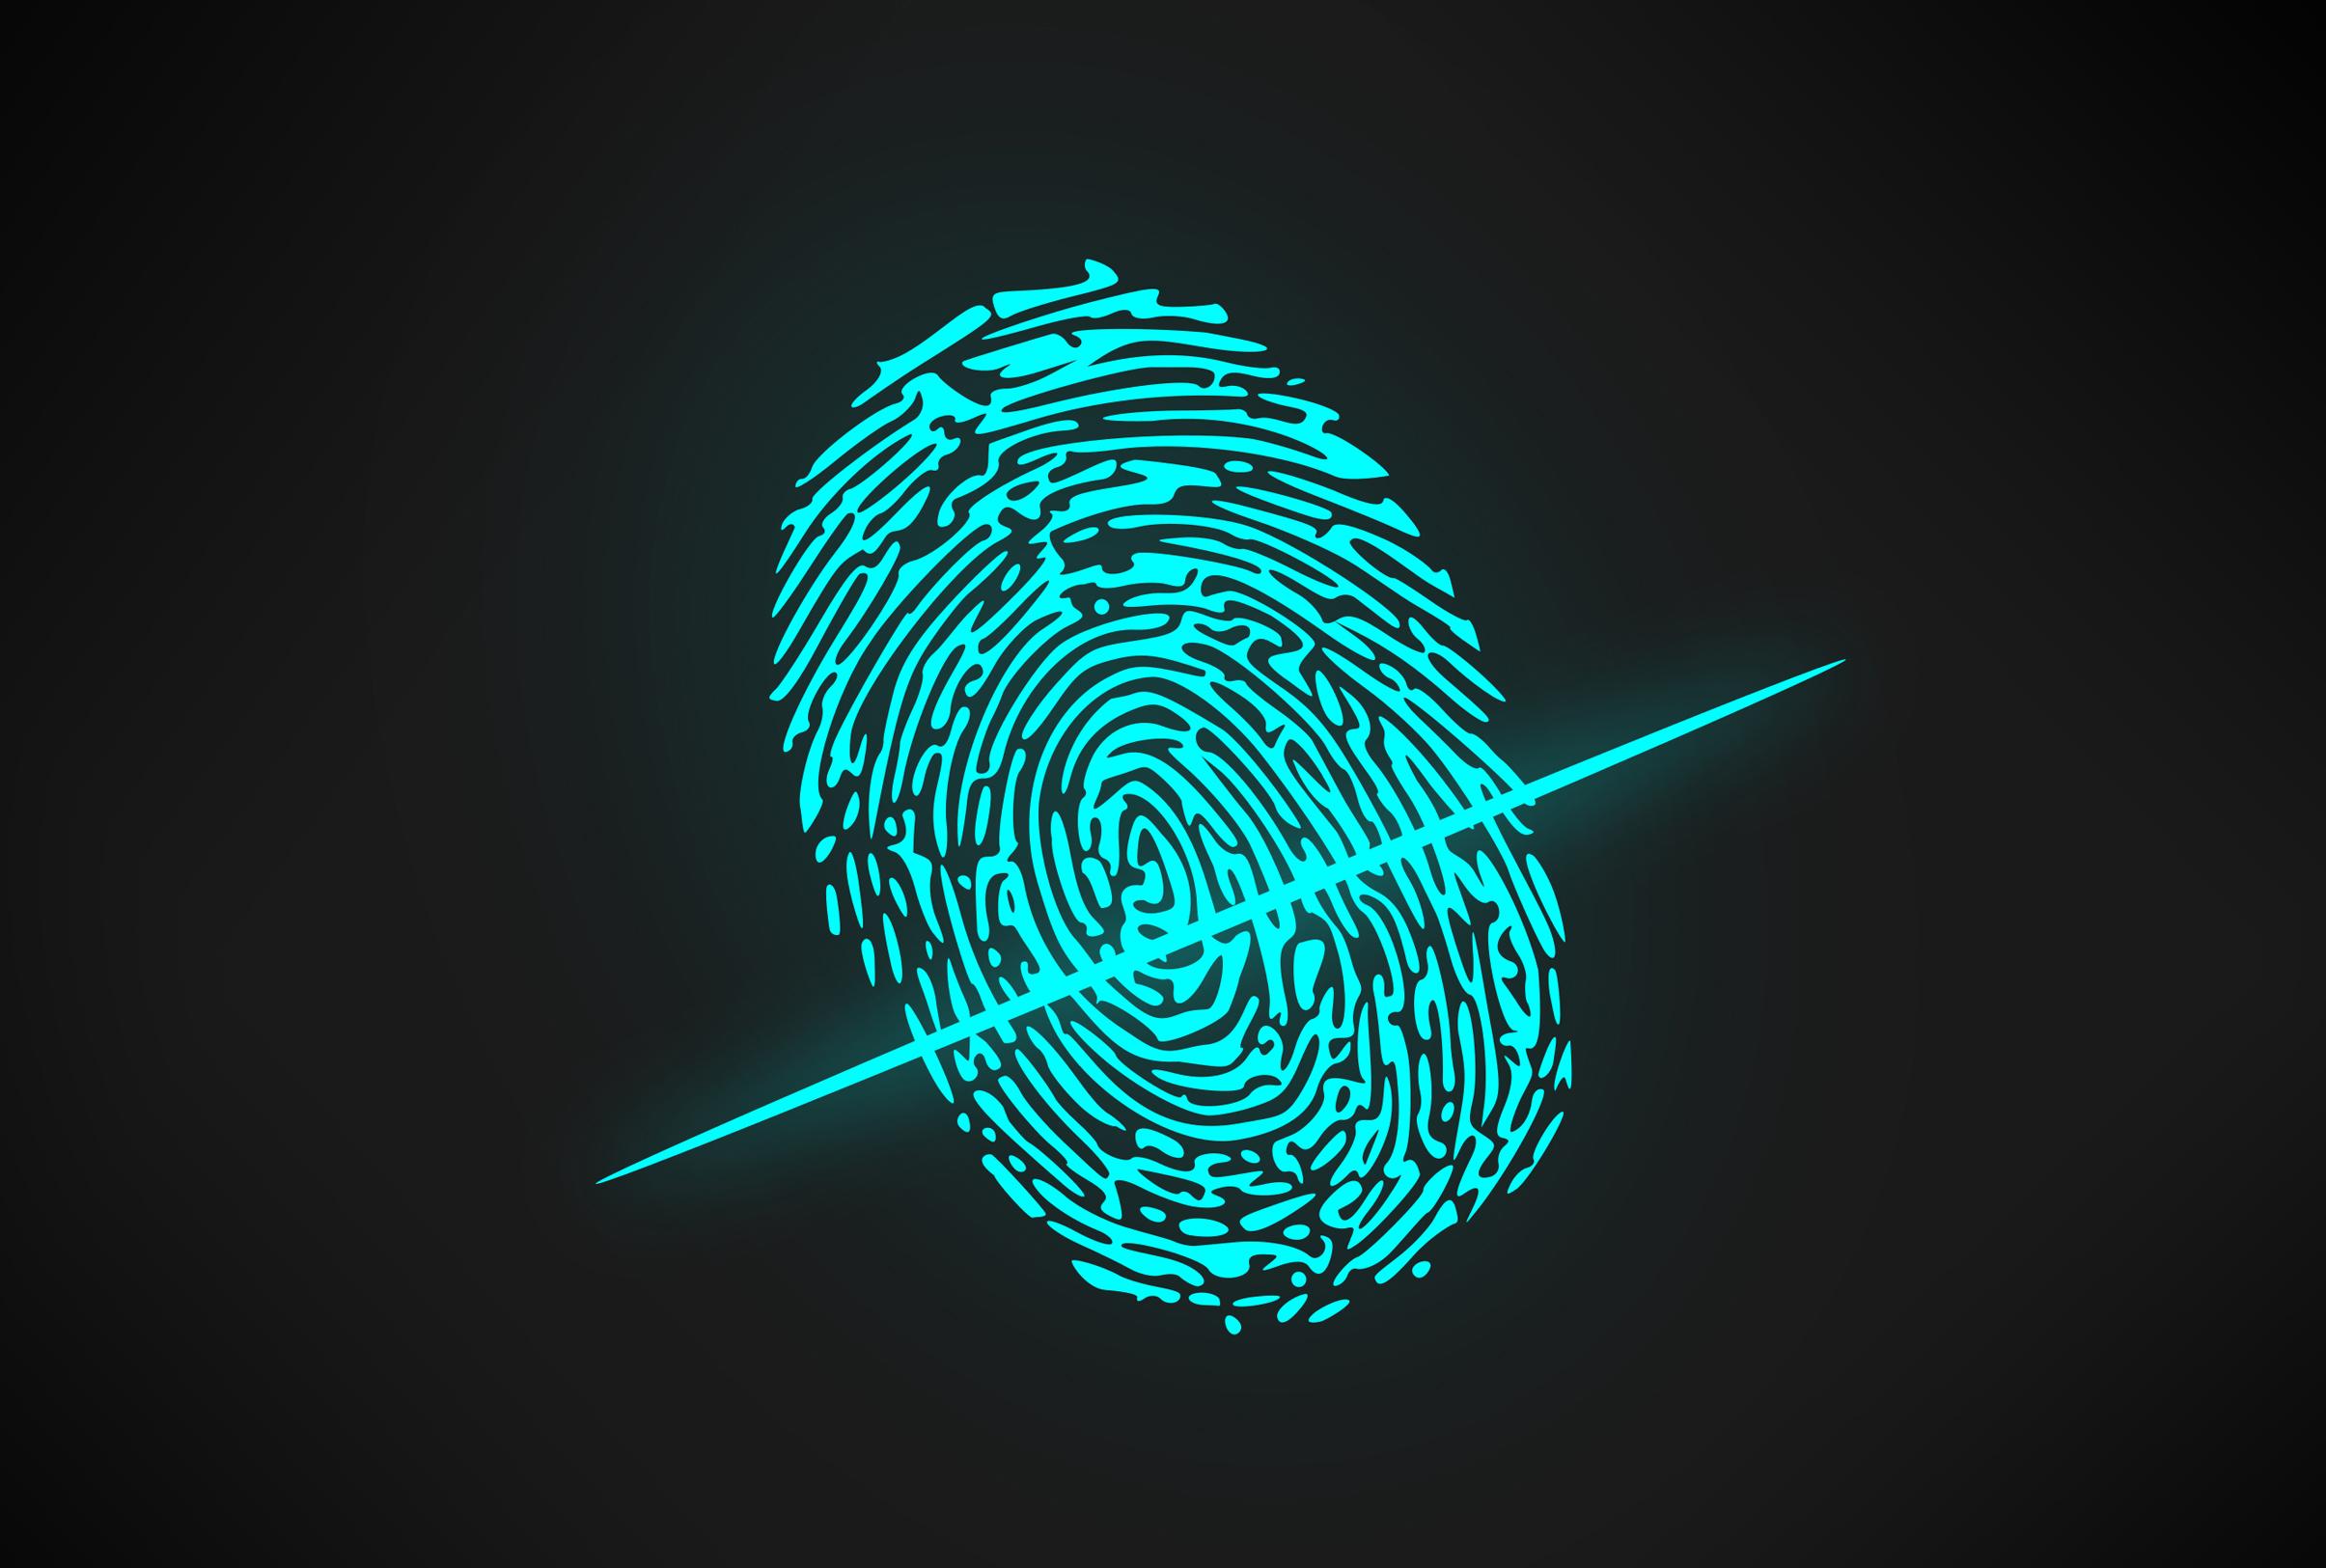 Biometric Authentication Software - Fingerprint, Access, Scanner, Macro, Modern, HQ Photo